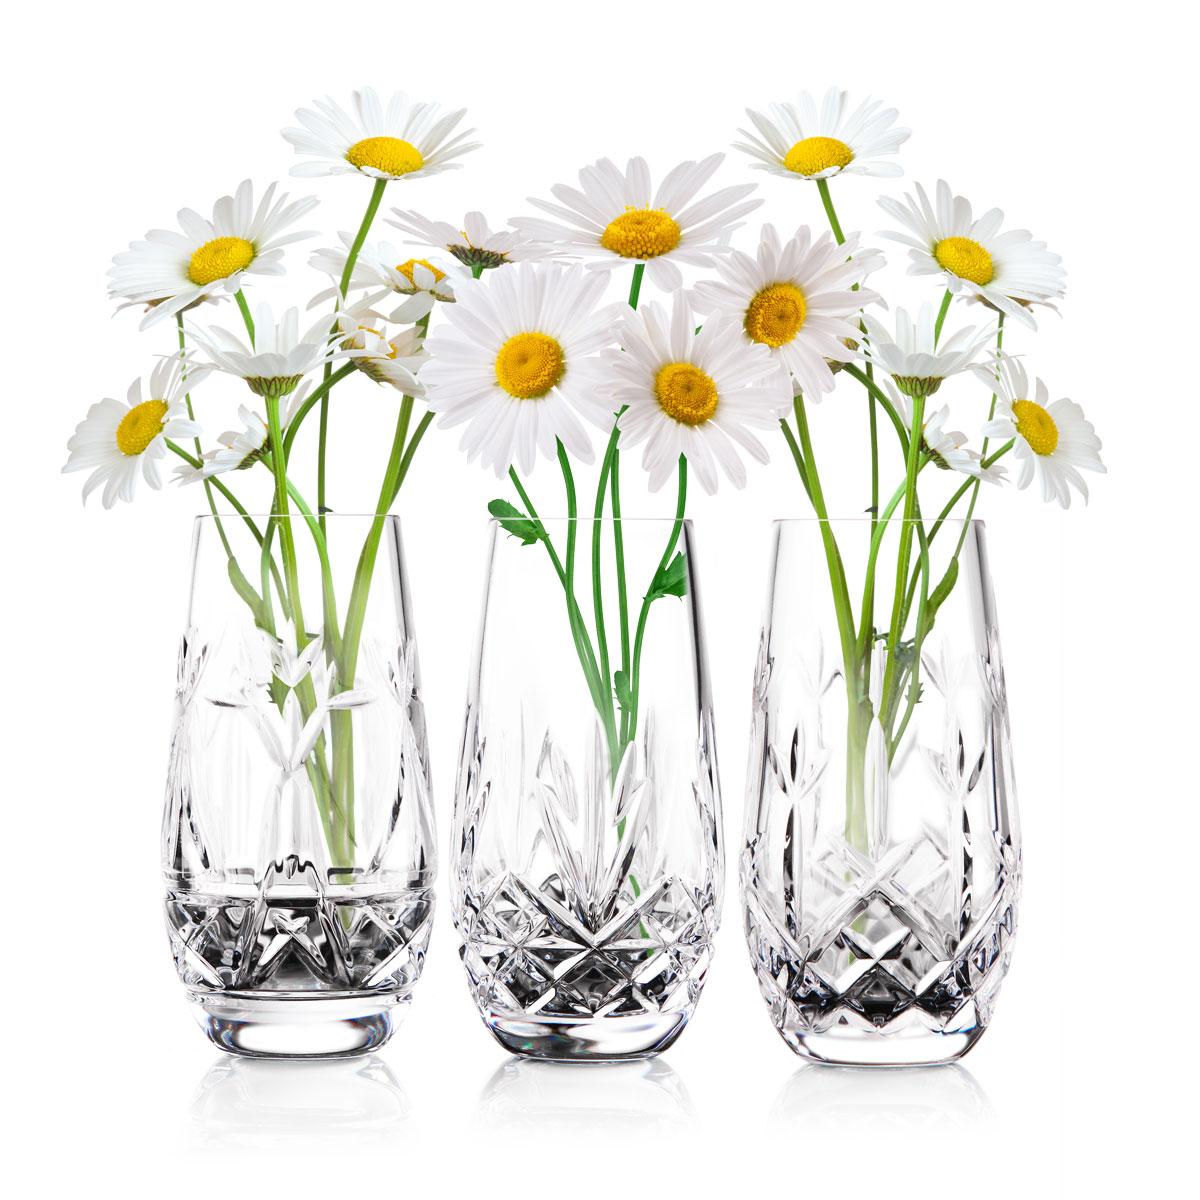 "Cashs Ireland, The Three Sisters, Set of Three 6"" Vases"